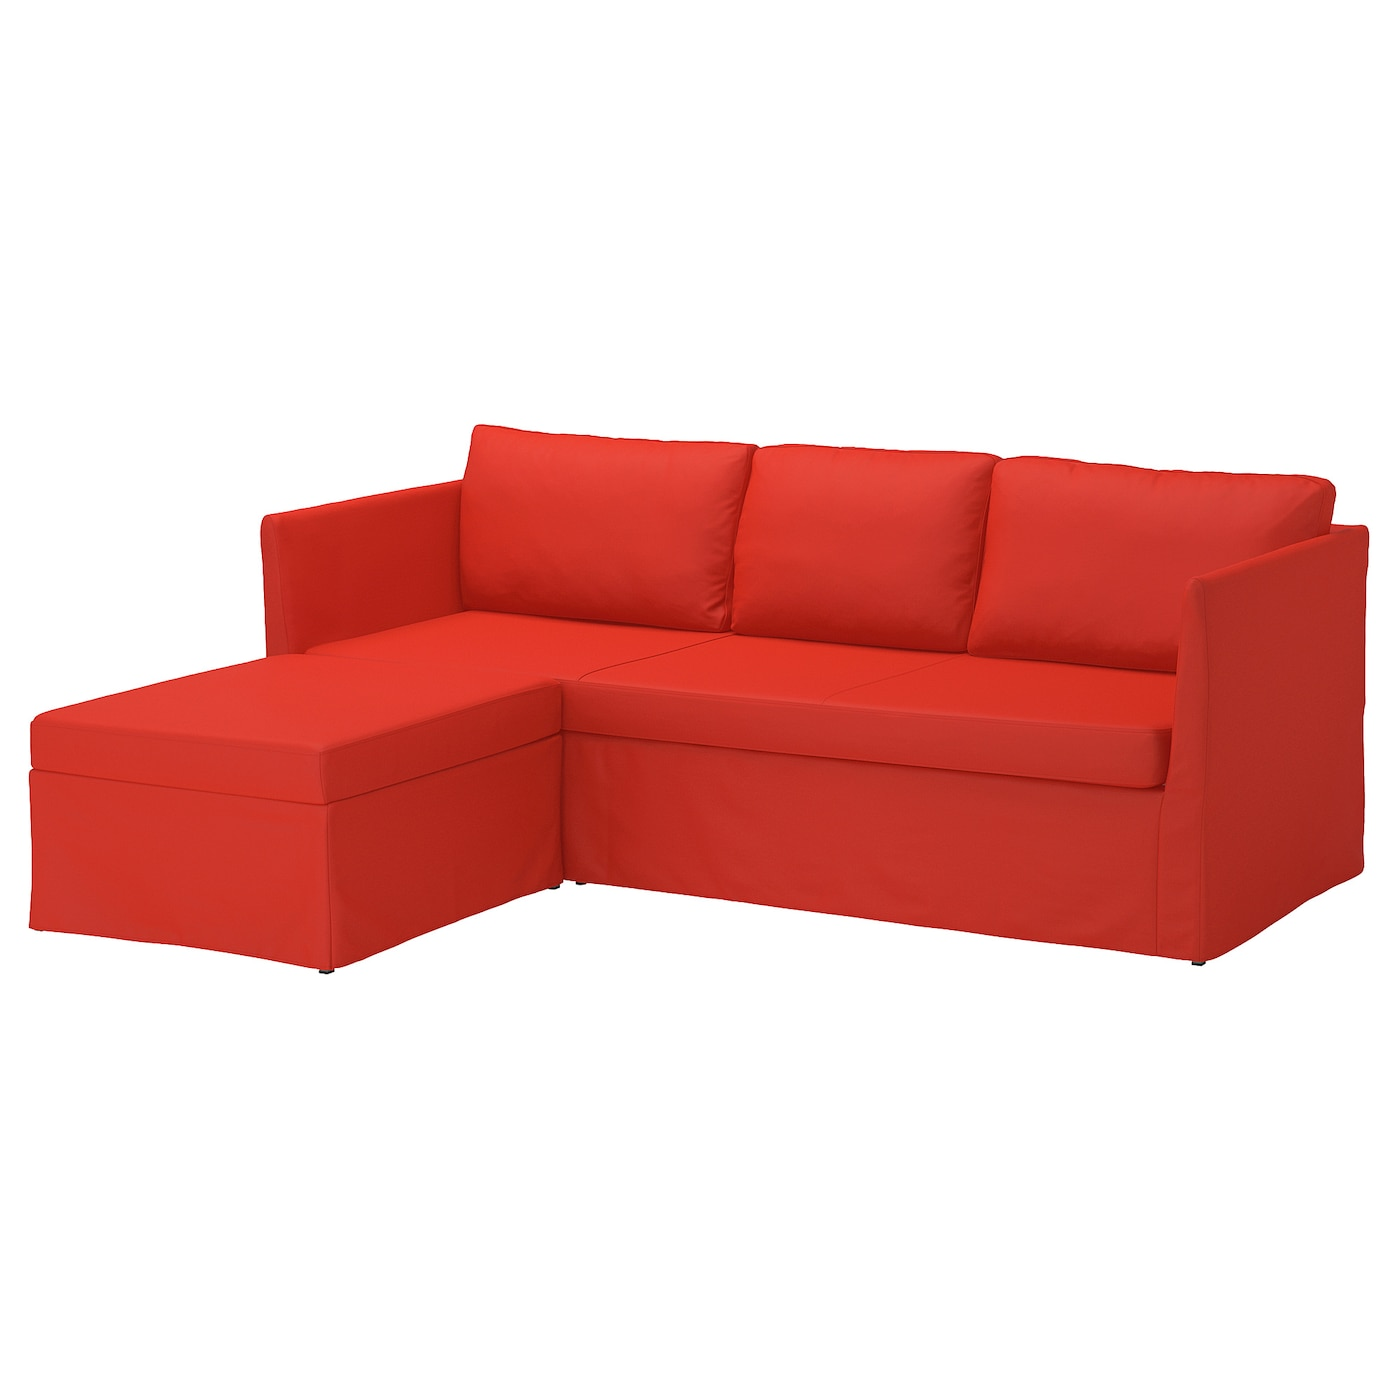 Ikea BrÅthult Cover For Corner Sofa